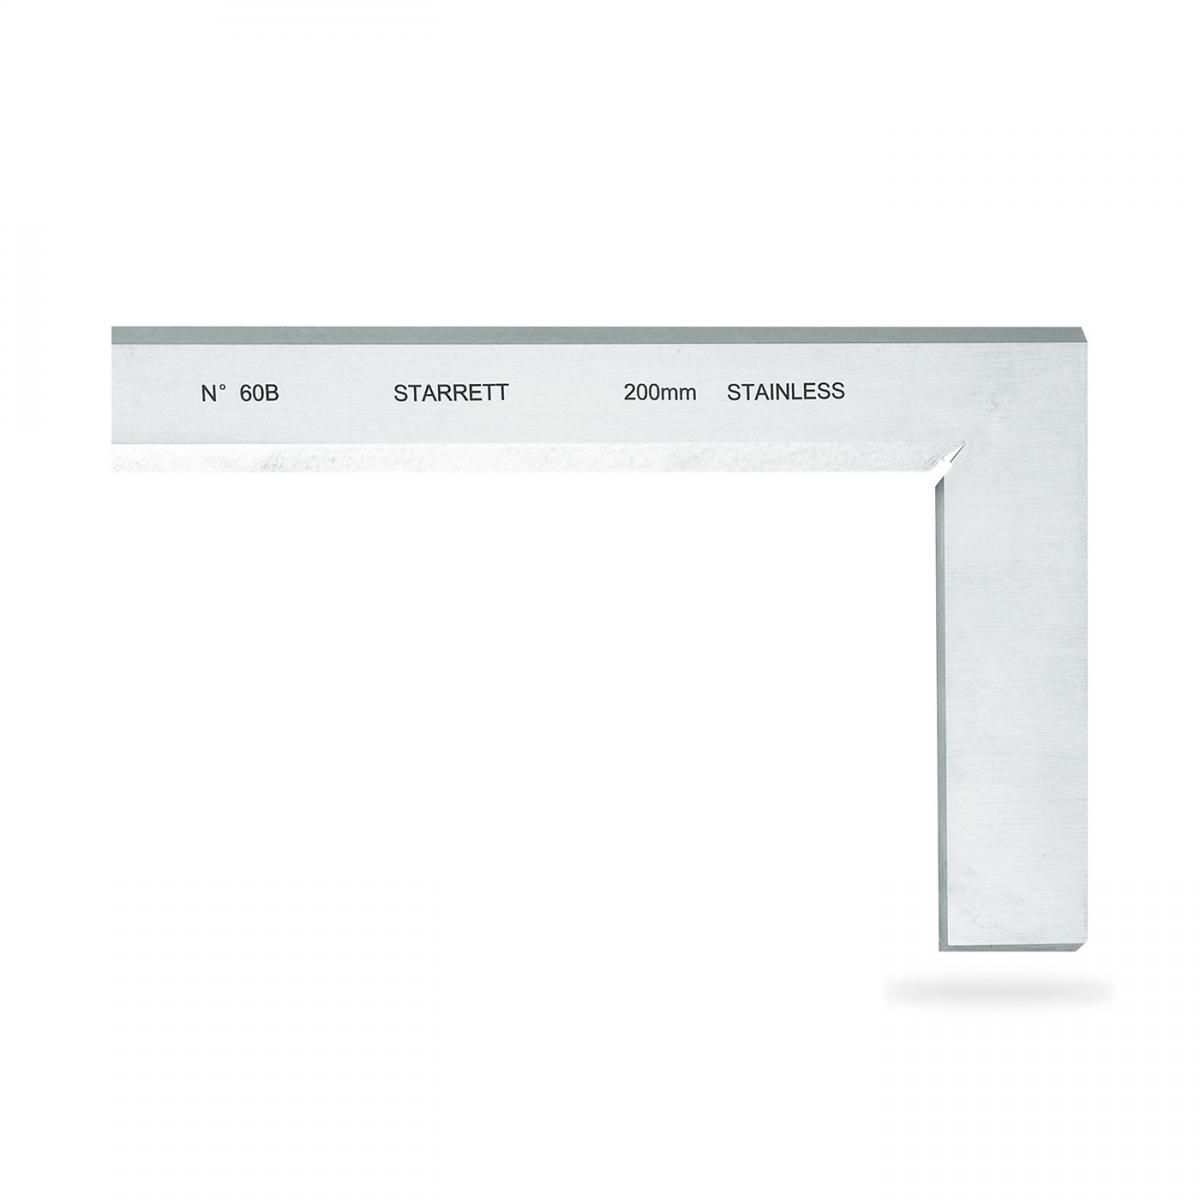 Esquadro Inox 100 X 70mm C/Fio 60B-100 - Starrett